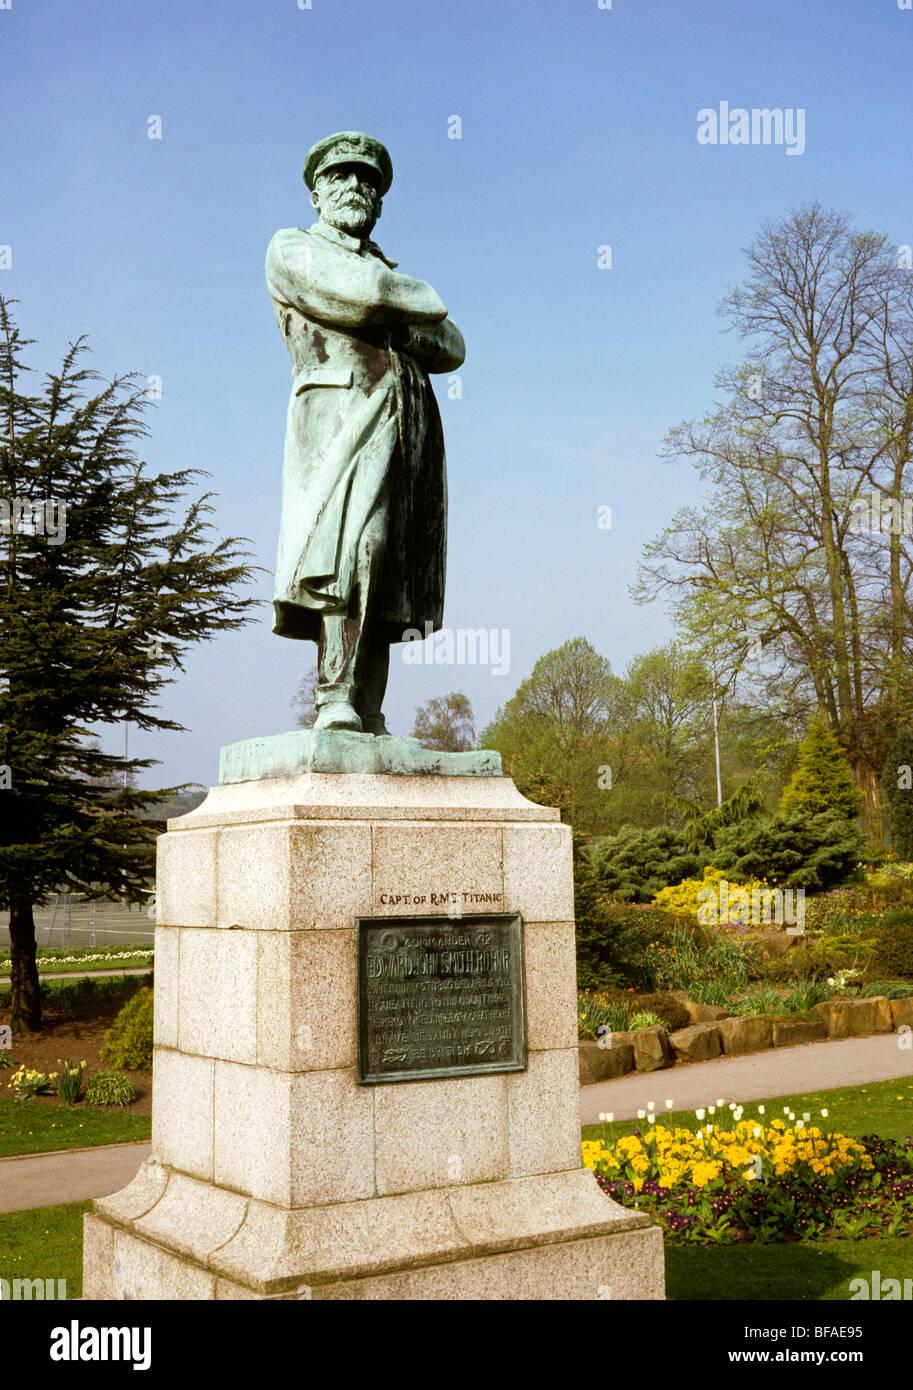 UK, England, Staffordshire, Lichfield, Beacon Park, Statue to Commander Edward John Smith, captain of RMS Titanic - Stock Image